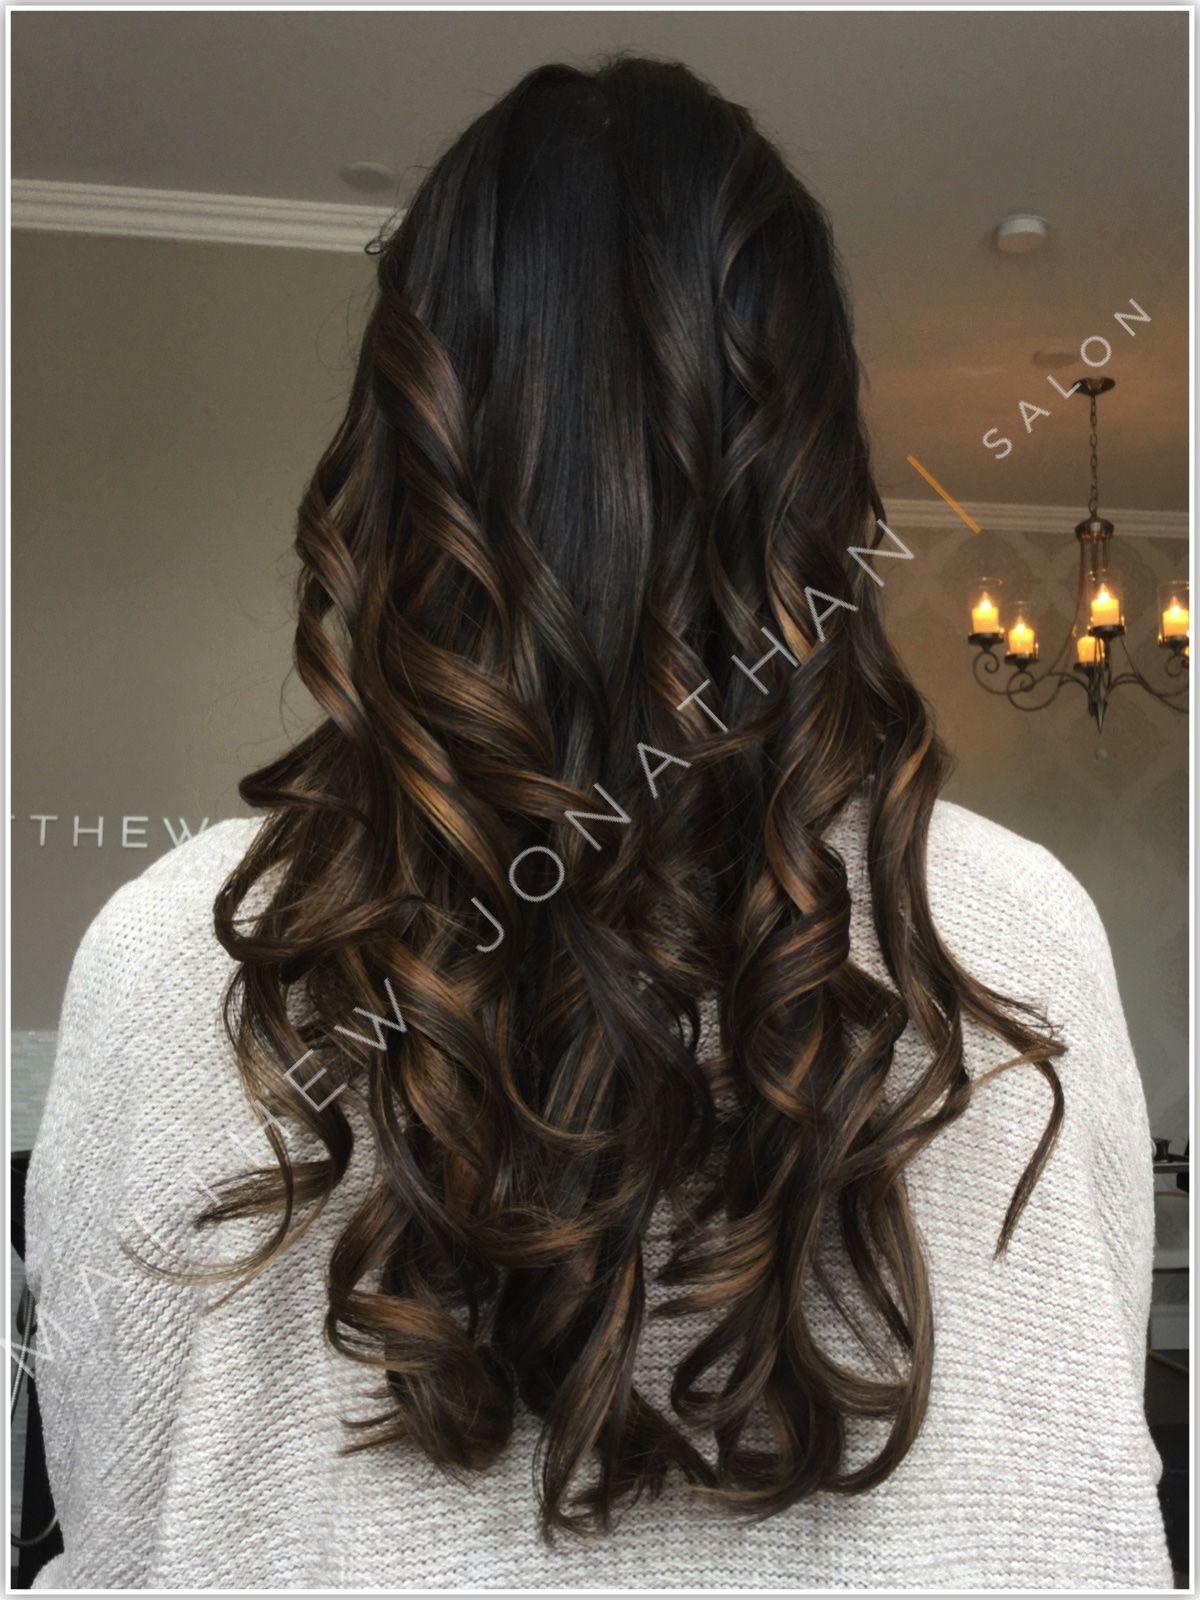 #hairtrends #flamboyage #Balayage #Sombre #Ombre #MatthewJonathan #Stylist  #Oakville #Salon #Halton #Hamilton #Milton #Toronto #Gta #Mississauga  #Etobicoke ...